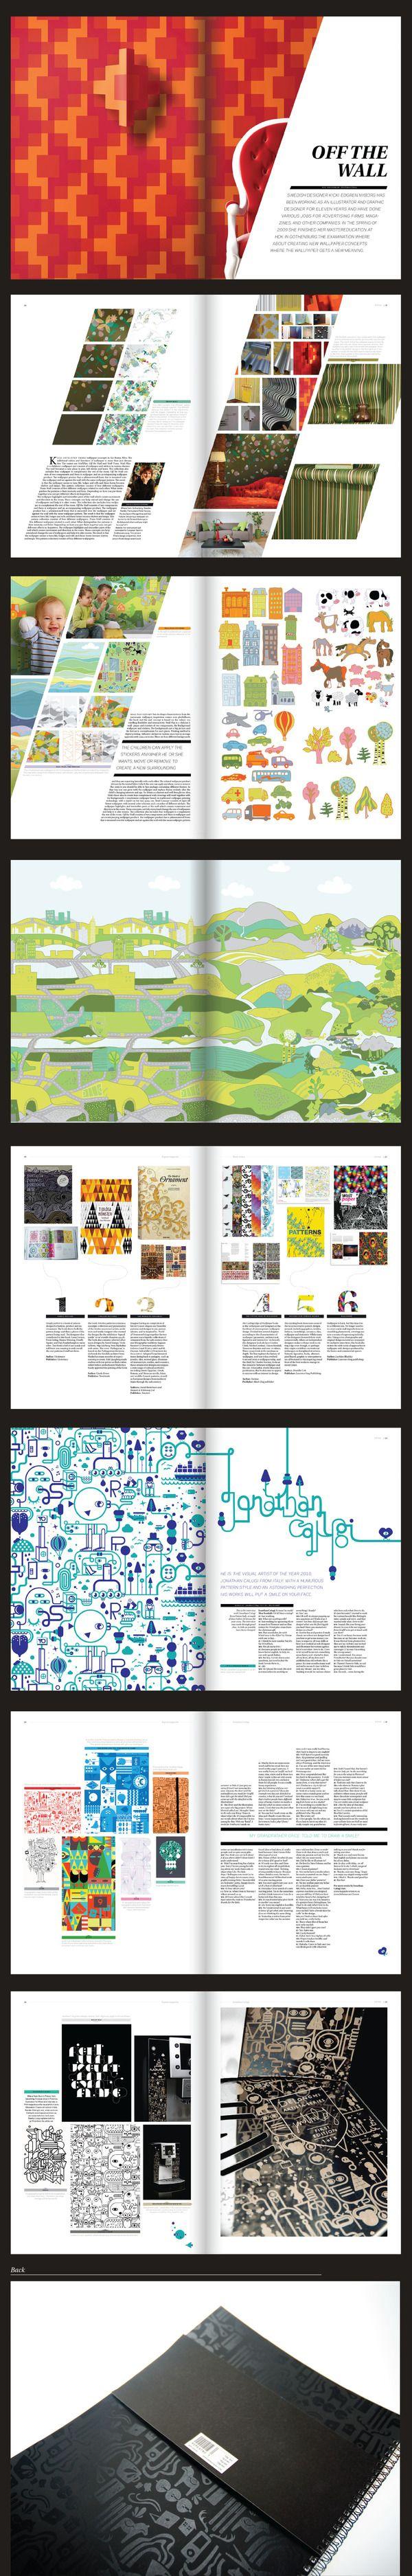 70 Exemplos de design editorial - Choco la Design | Choco la Design | Design como chocolate, deixa tudo mais gostoso. more on http://html5themes.org